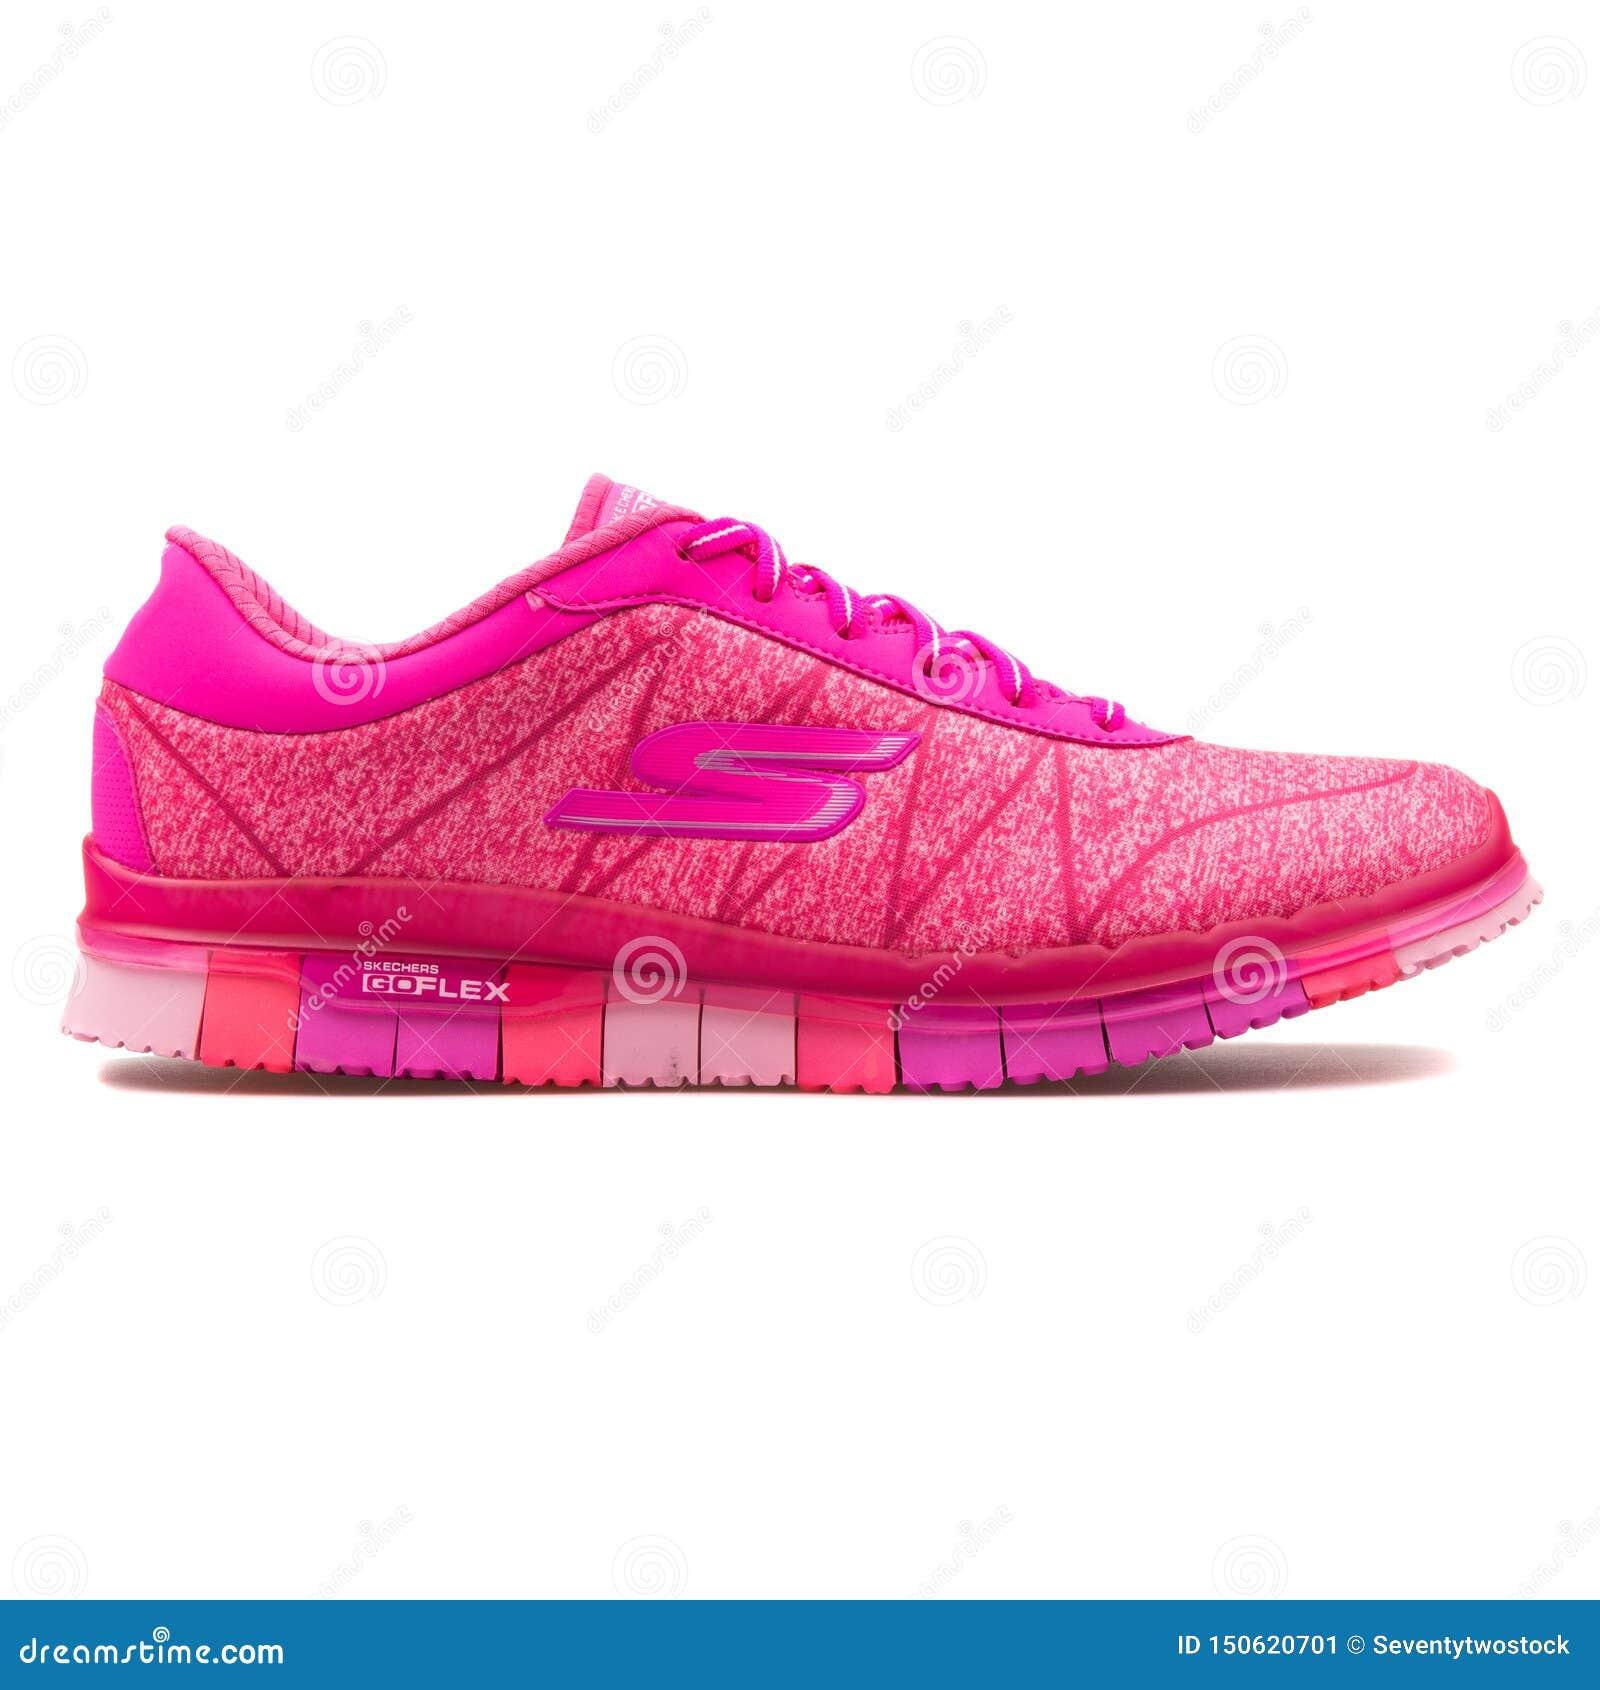 skechers flex pink